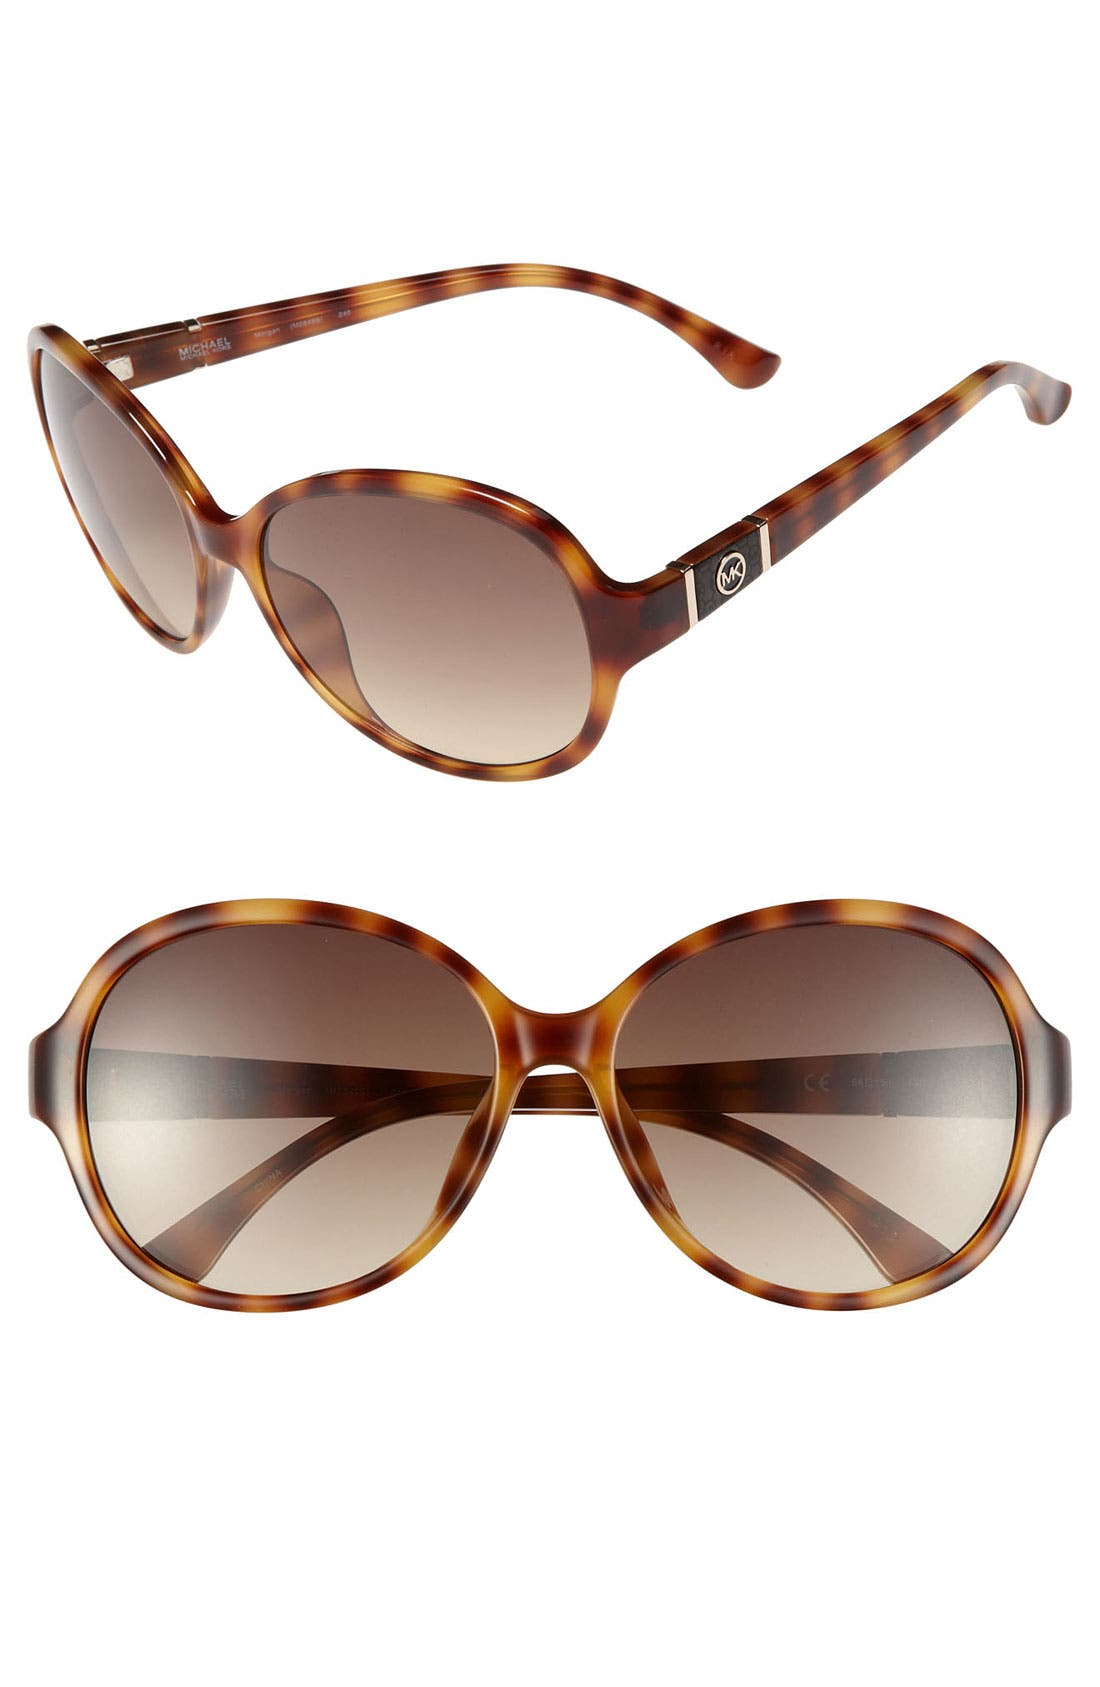 Main Image - MICHAEL Michael Kors 'Morgan' 58mm Sunglasses (Online Only)